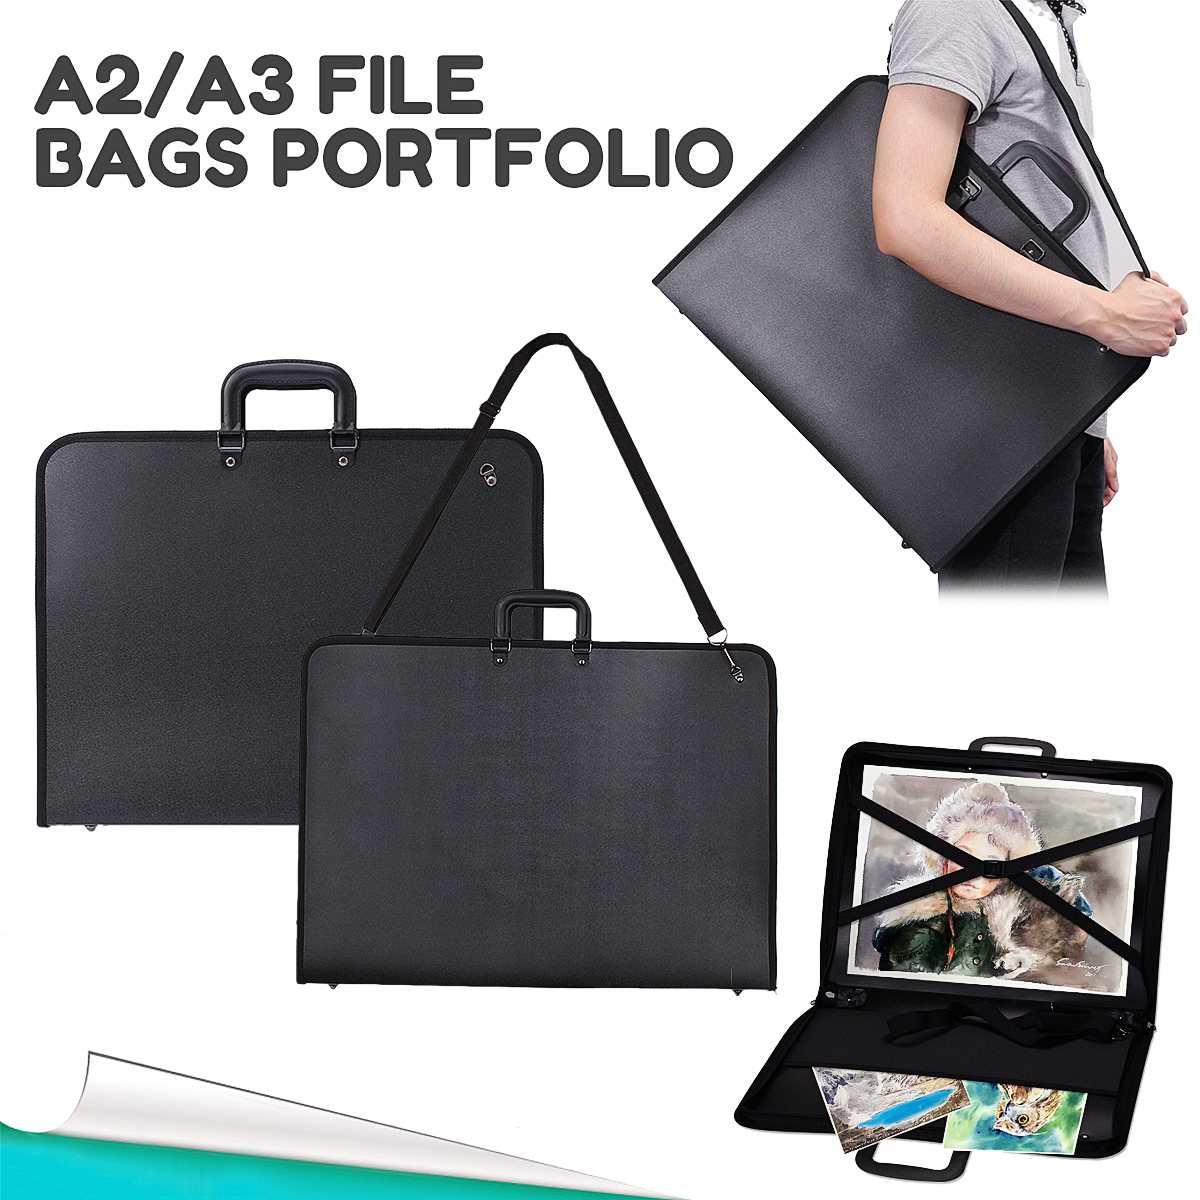 1pcs A2 A3 Vinyl Artist Portfolio Drawing Painting Storage File Folder Plastic Document Carry Case For Art Set Sketch Supplies